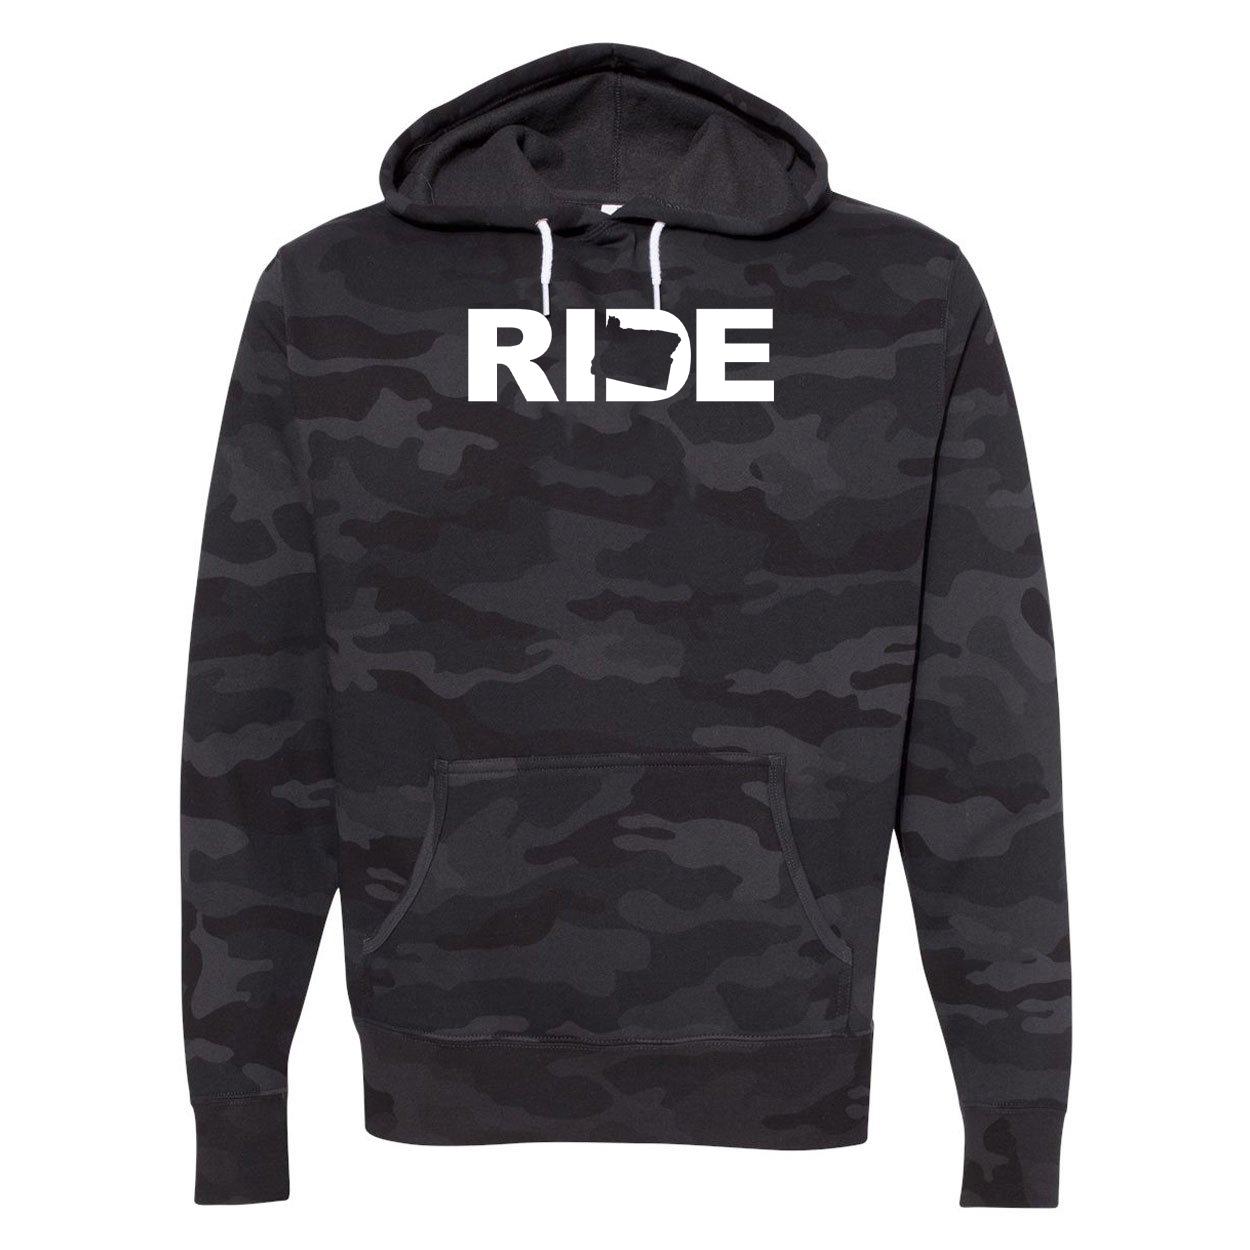 Ride Oregon Classic Unisex Hooded Sweatshirt Black Camo (White Logo)